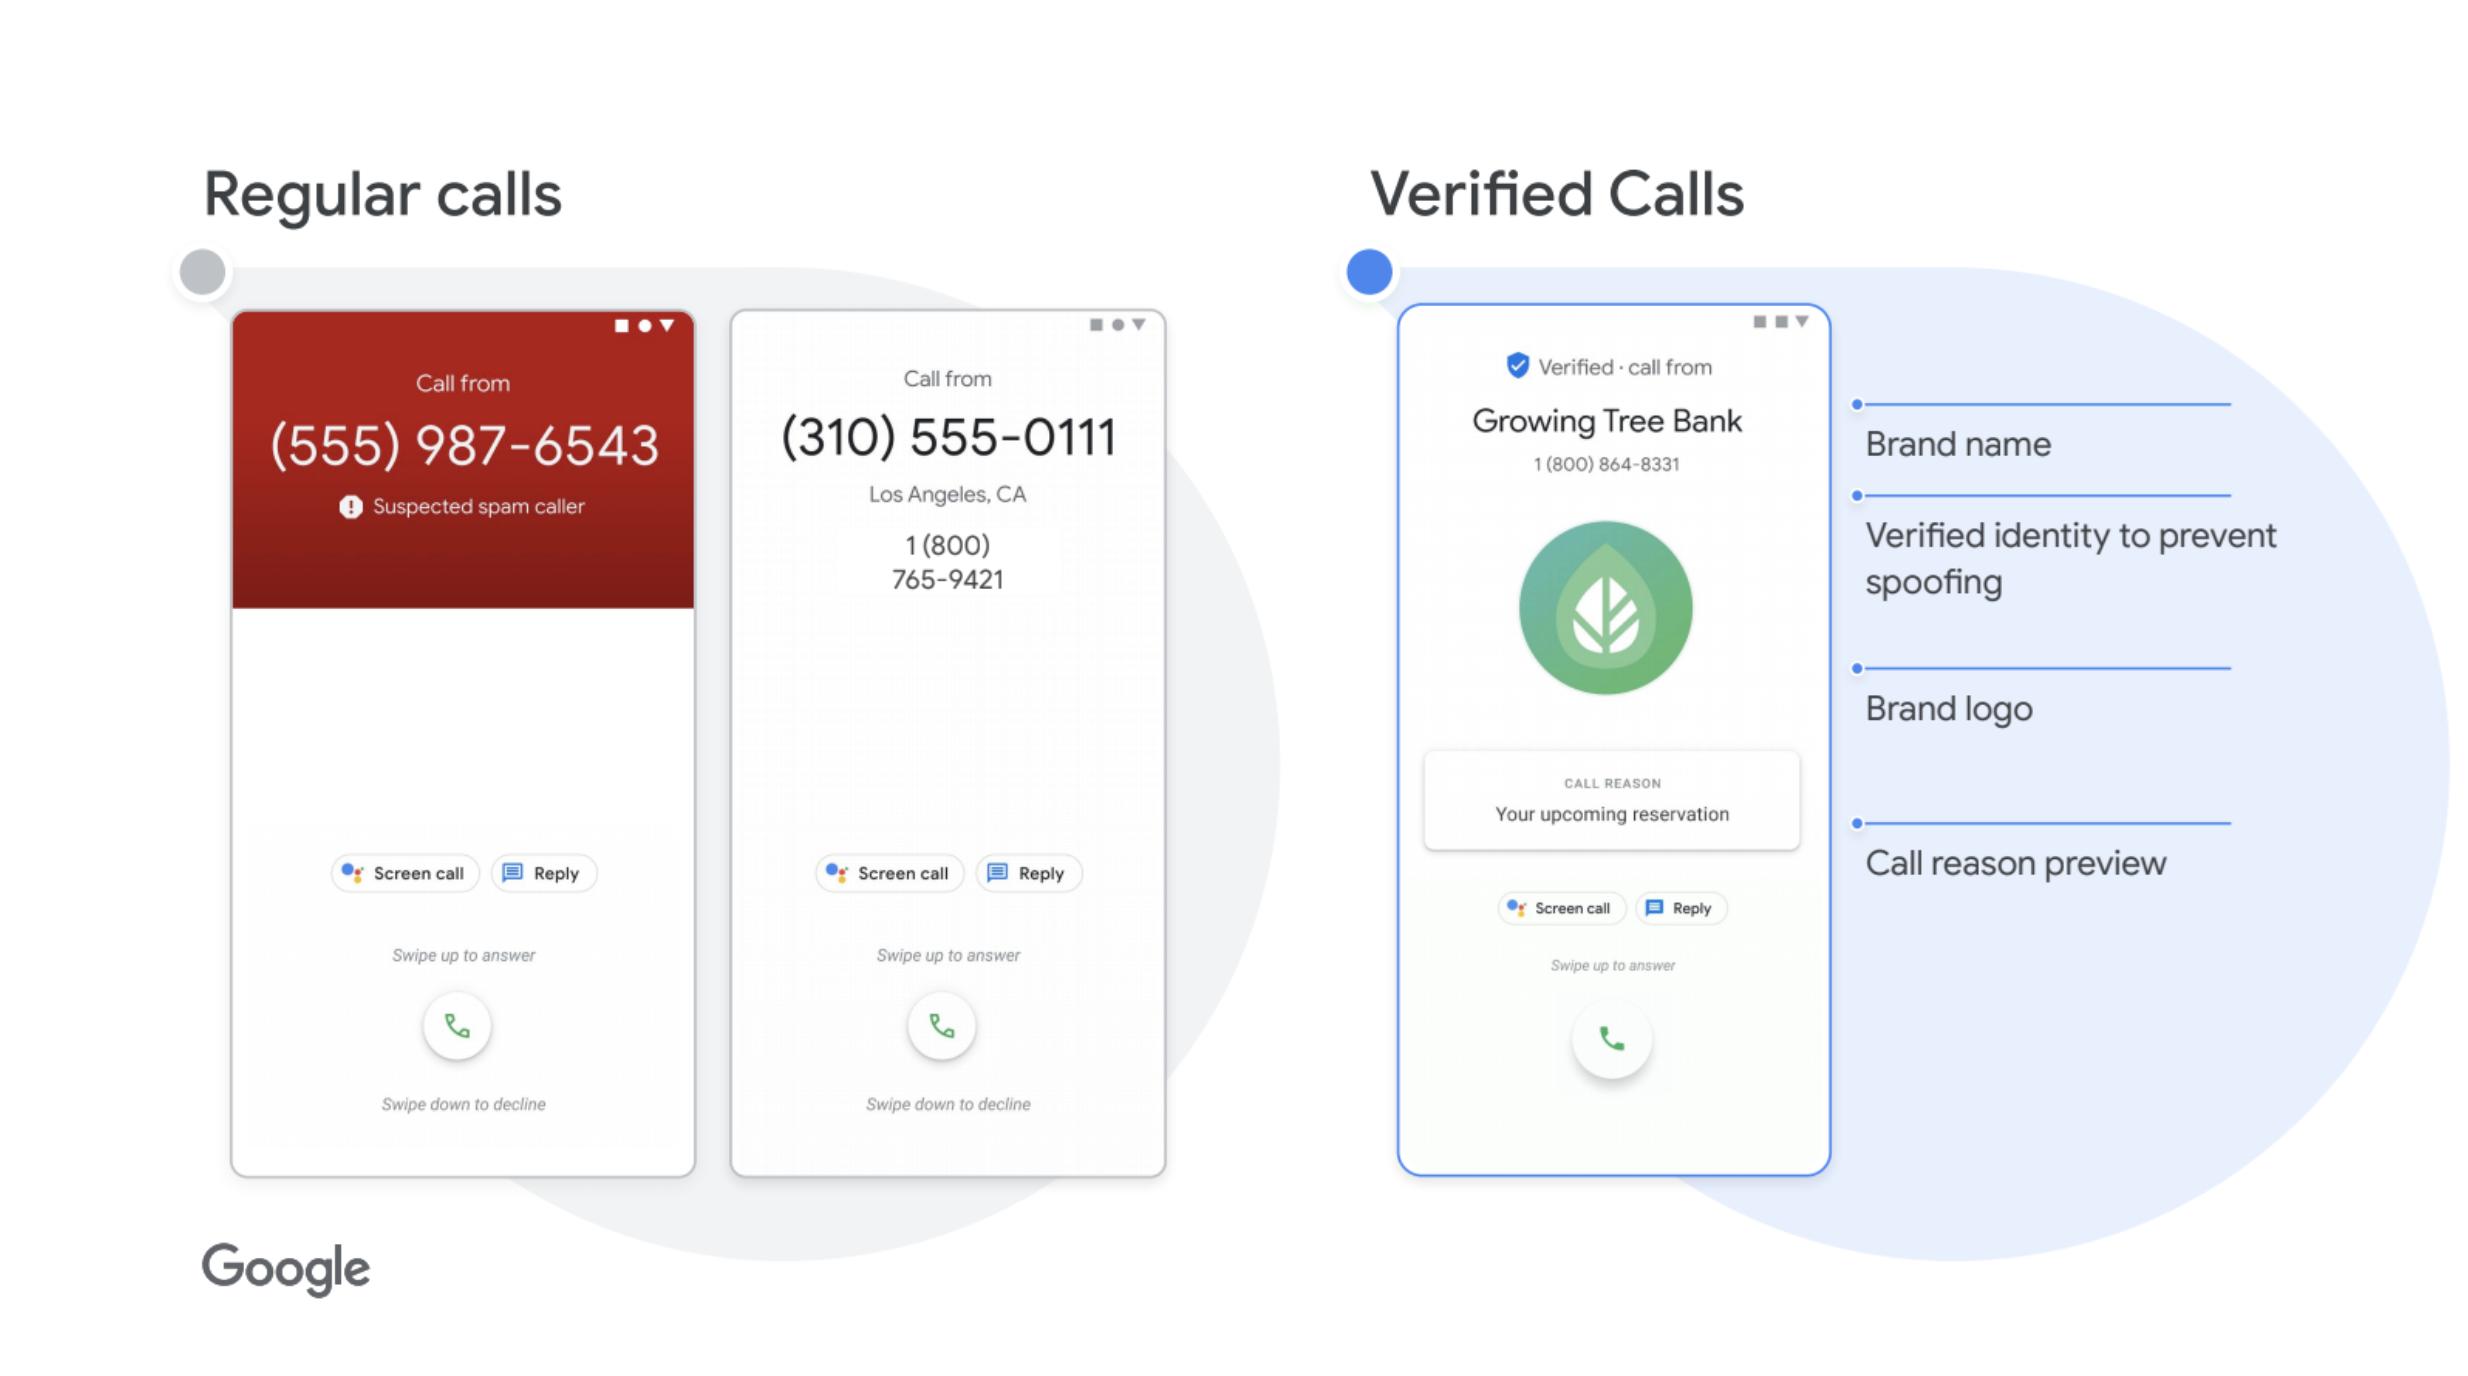 Regular Calls versus Verified Calls by Google